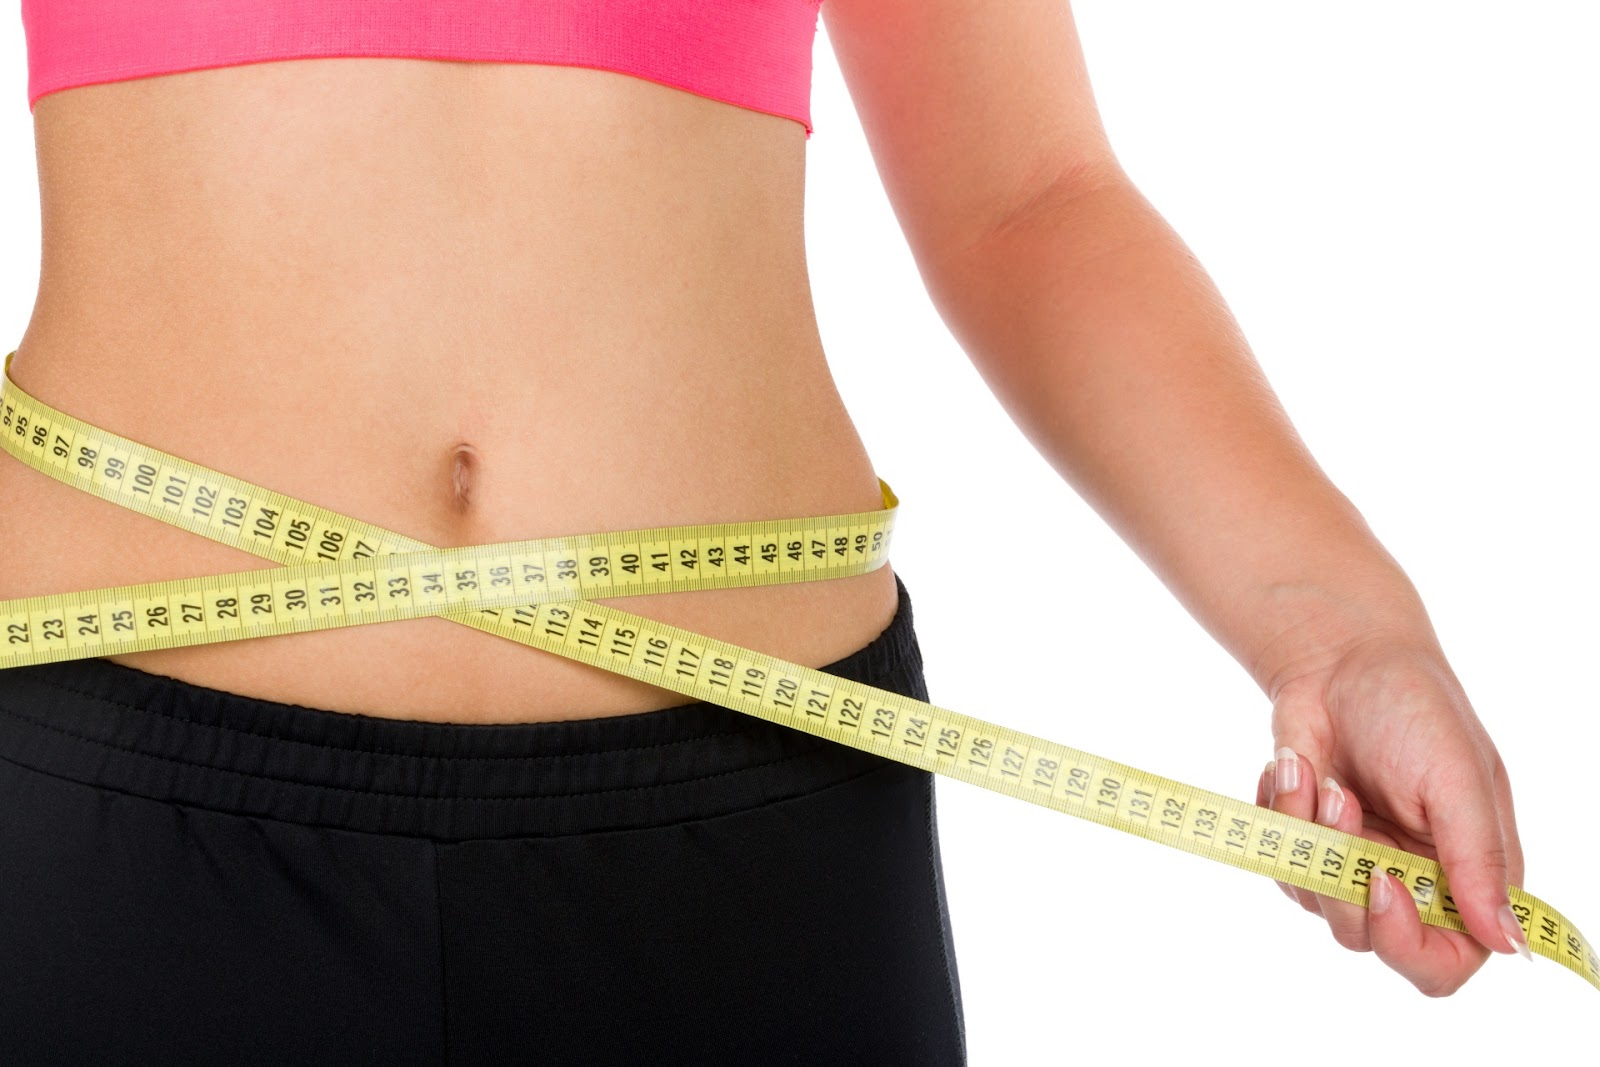 fit-belly-and-tape-measure-1483641375NOP.jpg